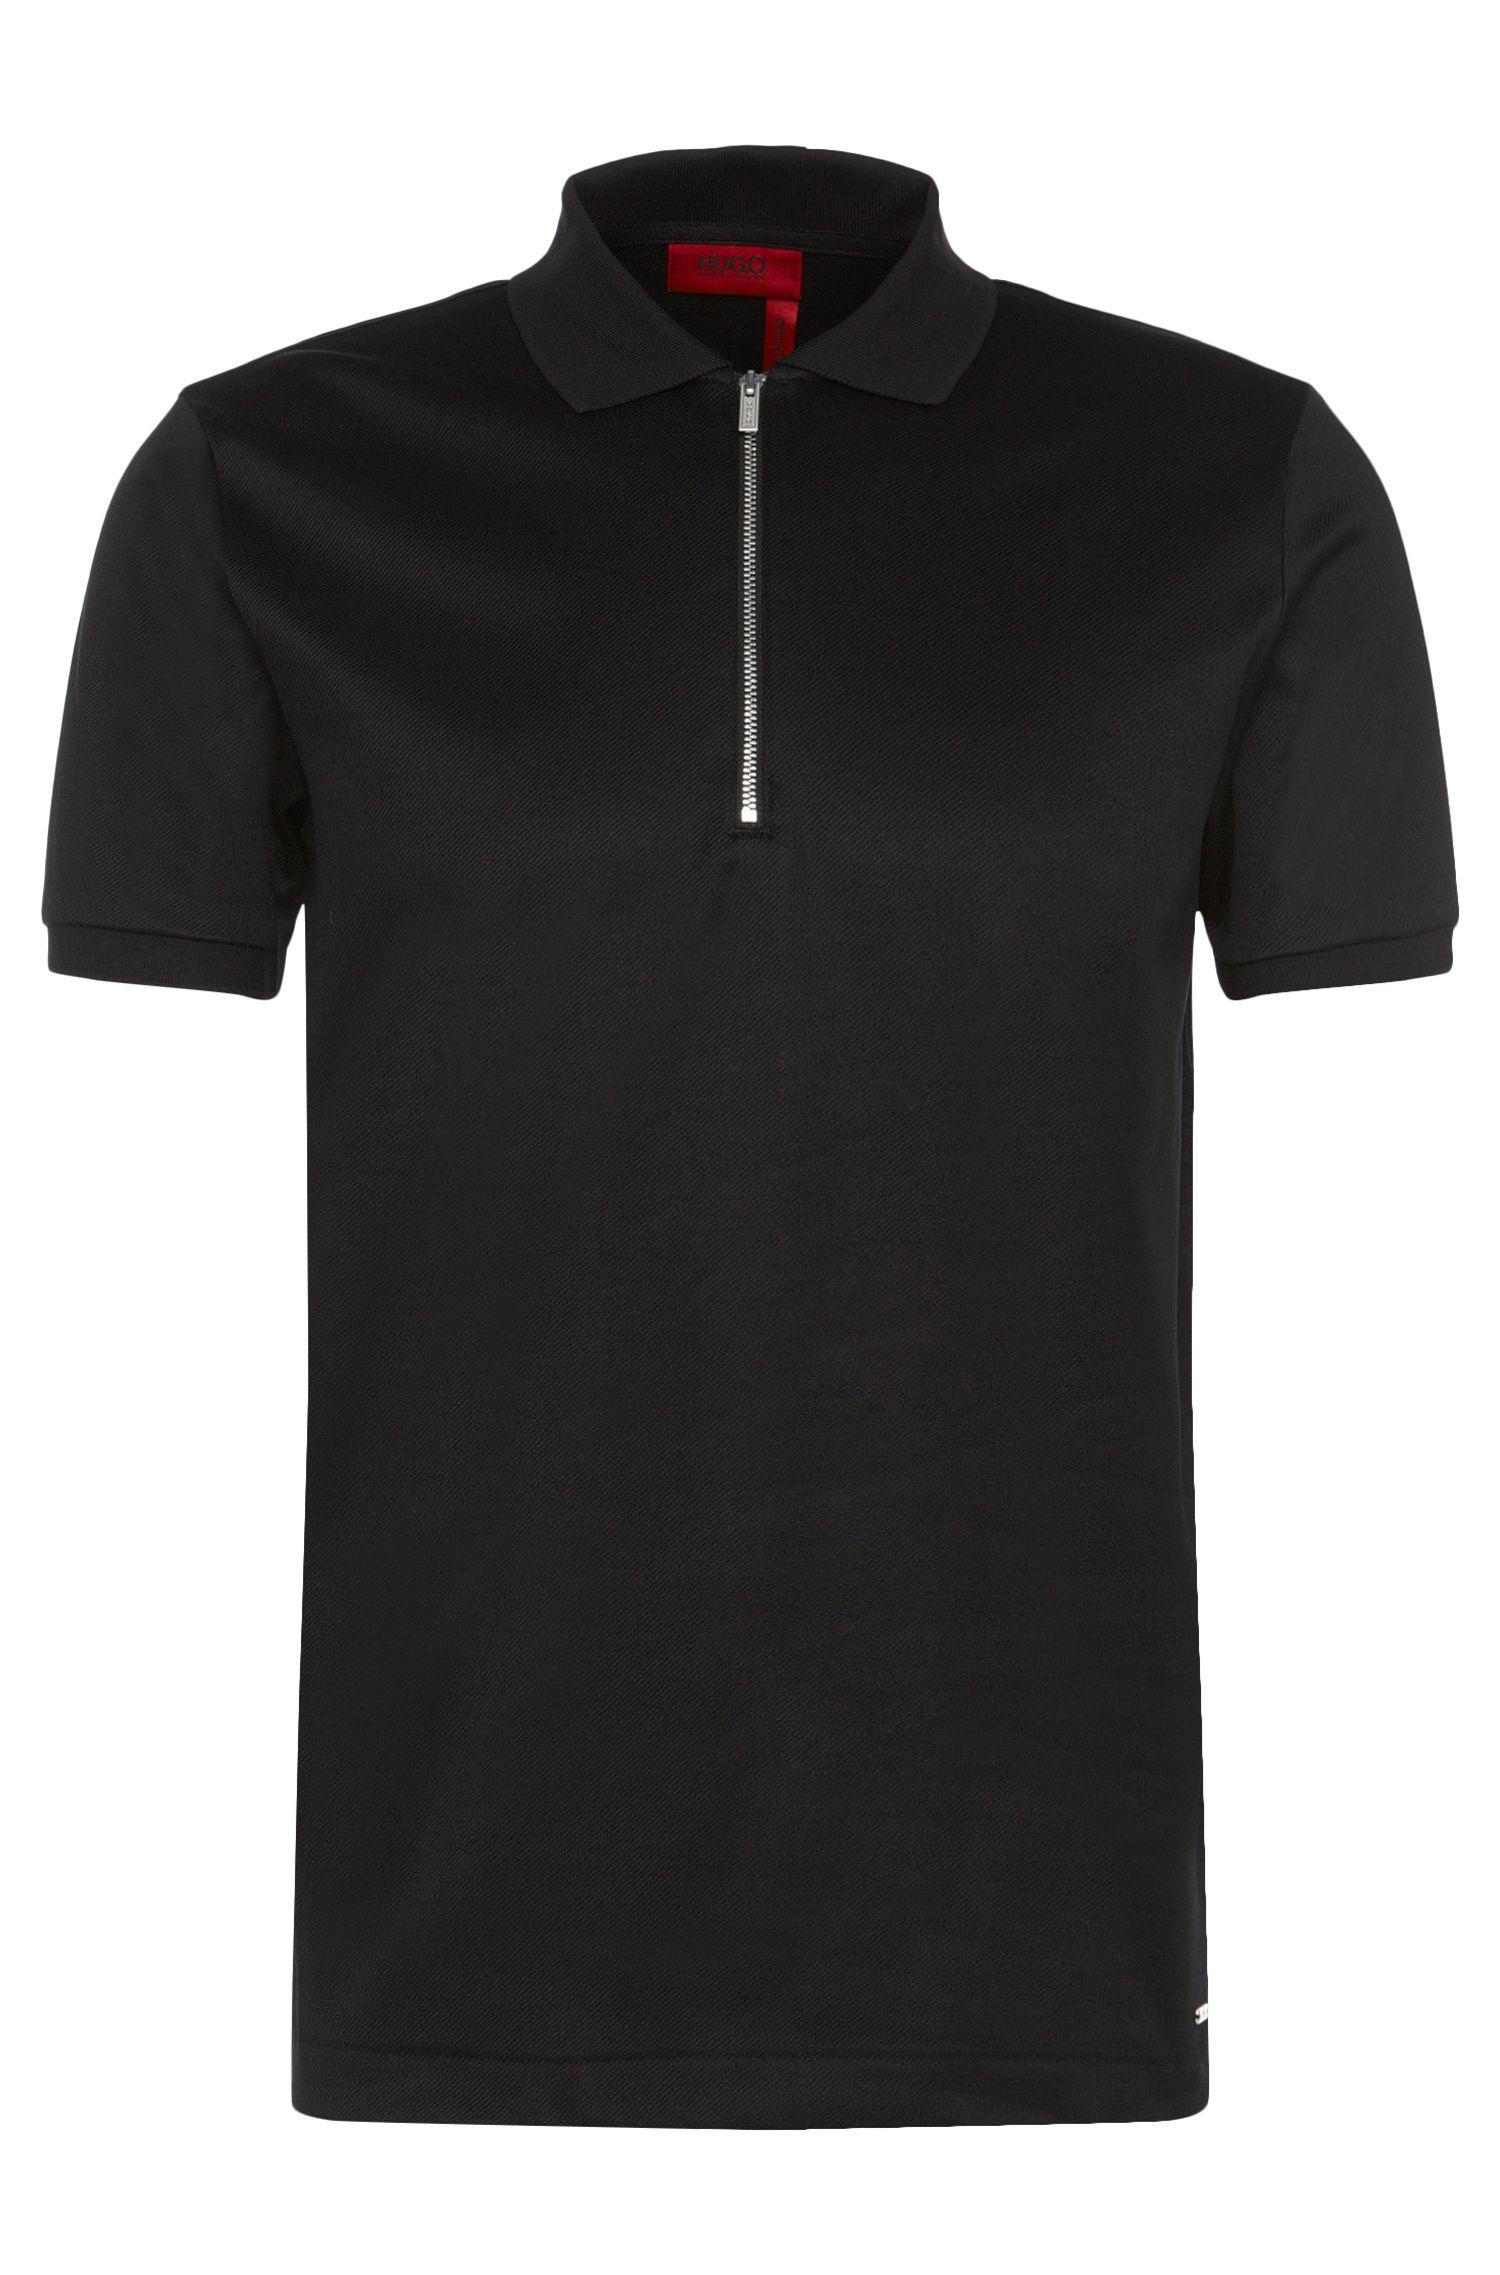 Mercerized Cotton Twill Polo Shirt, Regular Fit   Digato